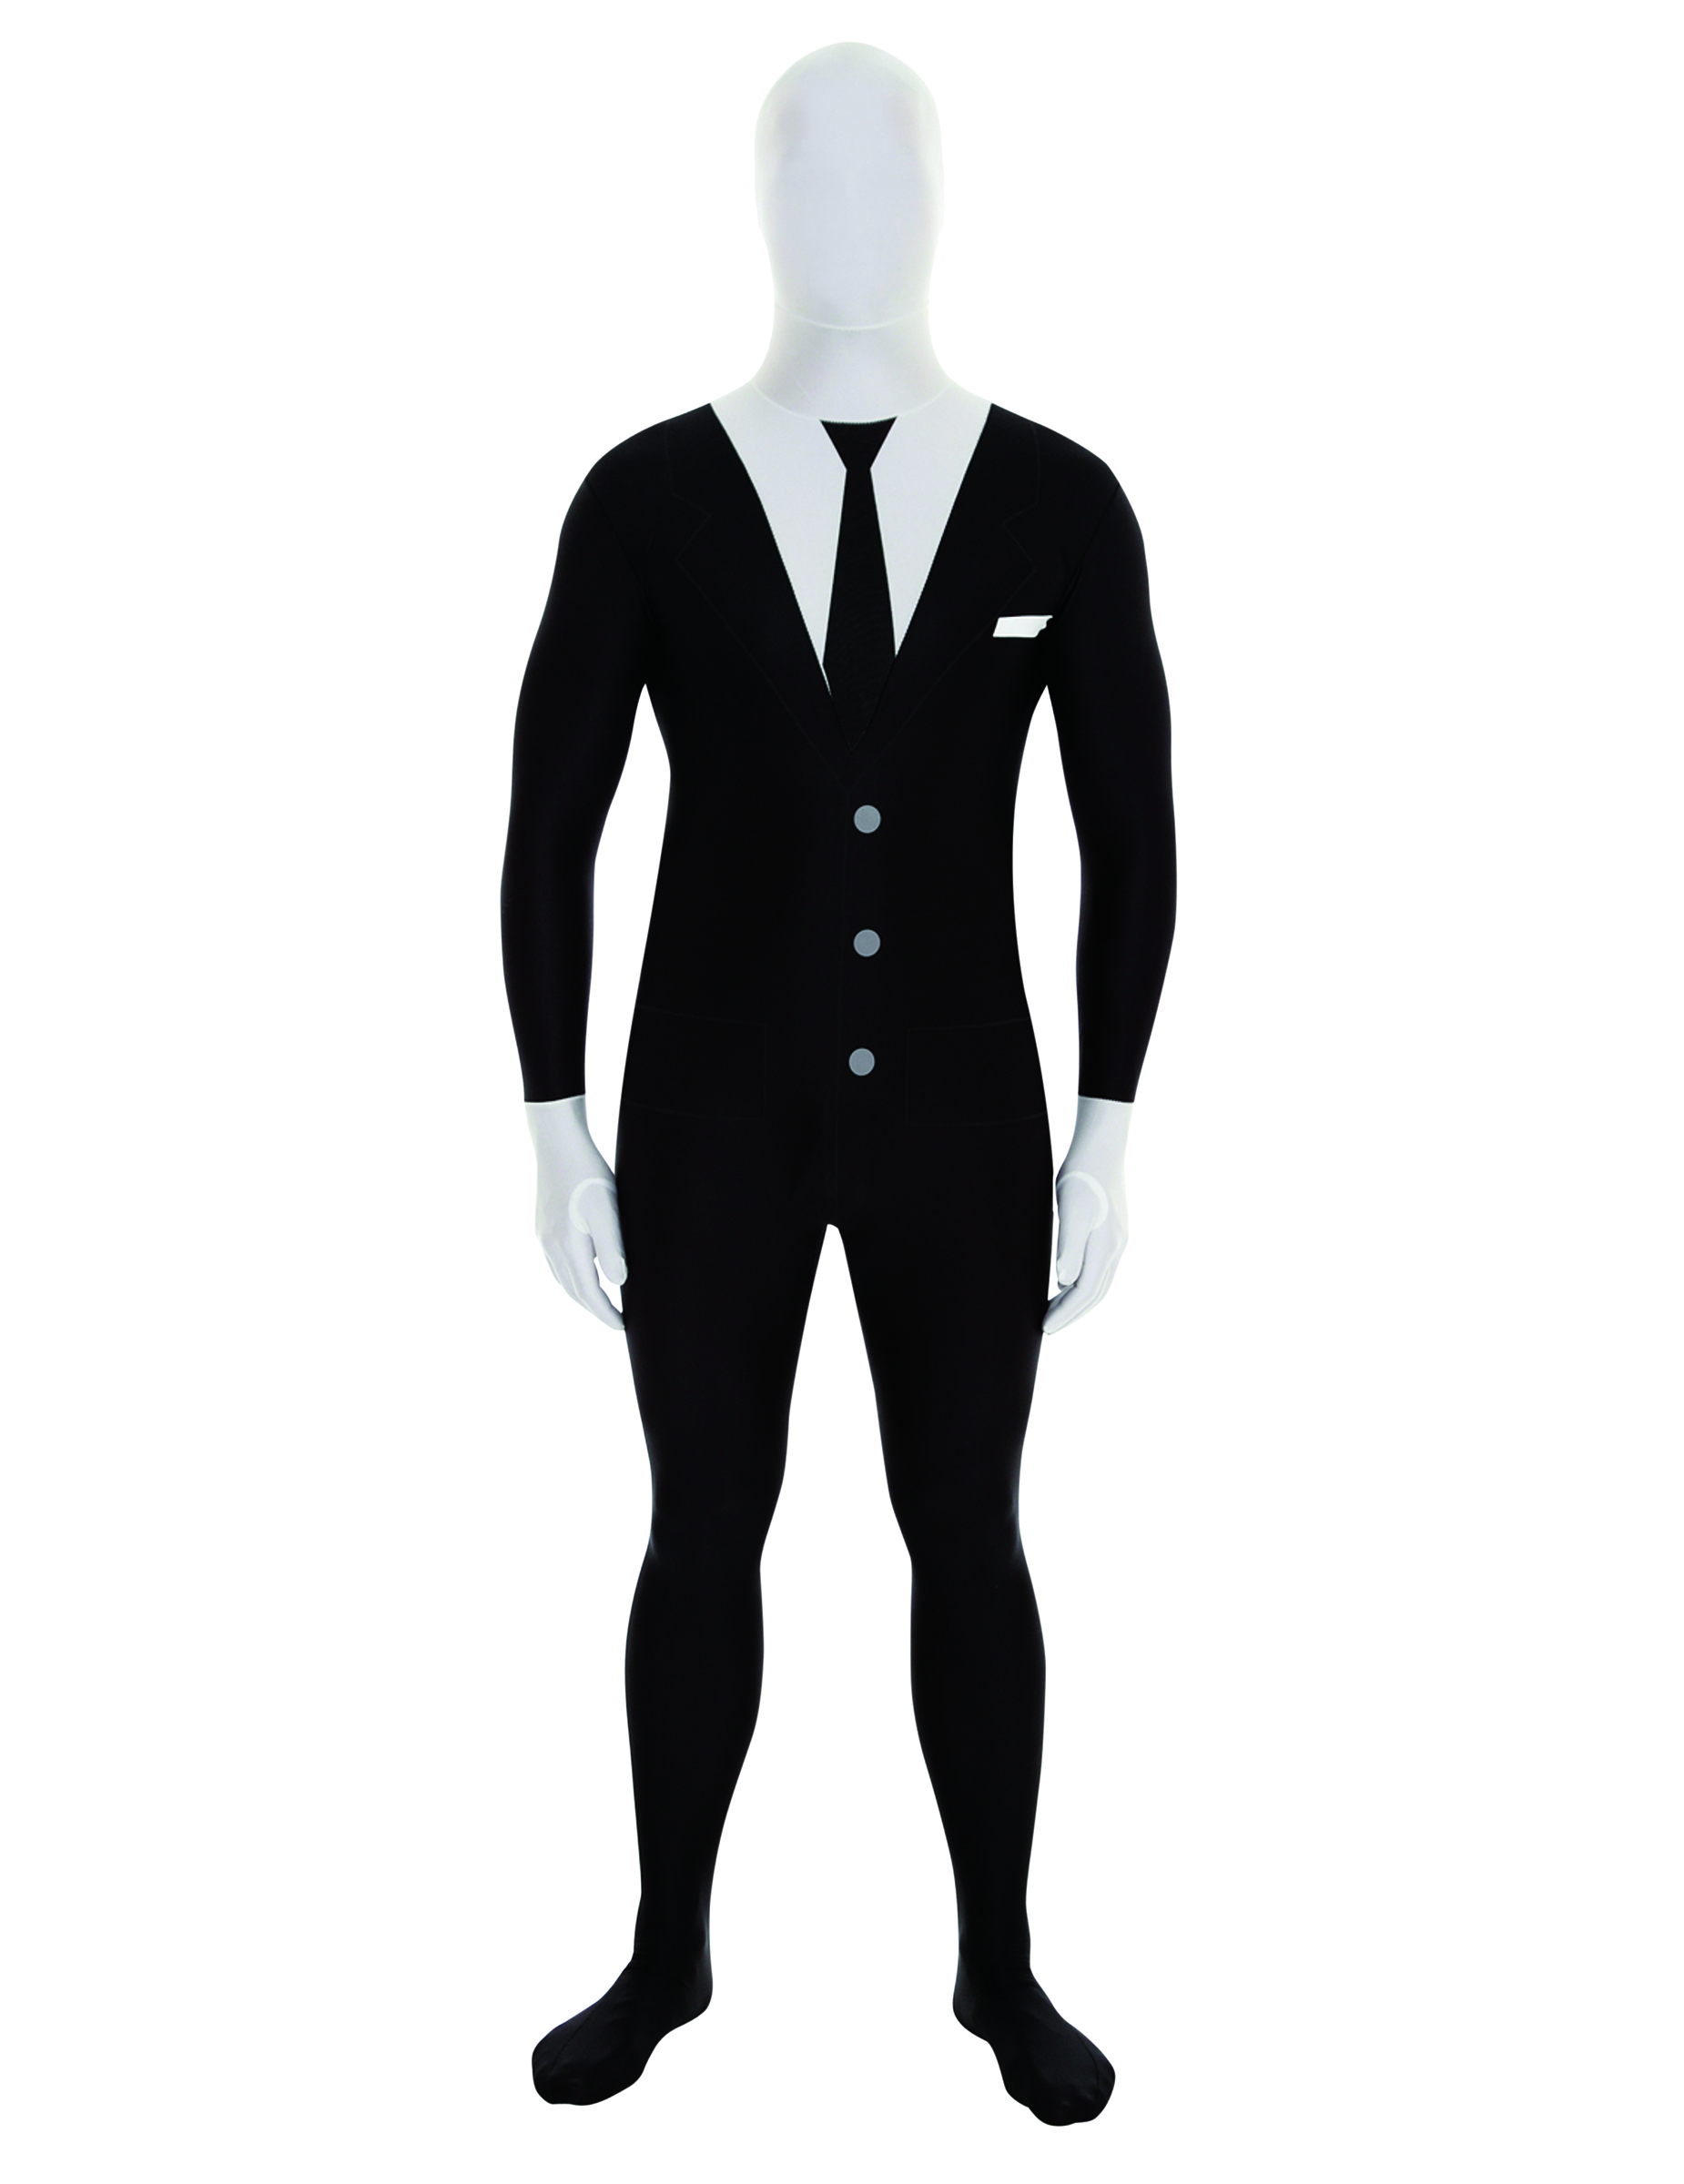 anzug morphsuit tuxedo kost m schwarz weiss g nstige faschings kost me bei karneval megastore. Black Bedroom Furniture Sets. Home Design Ideas